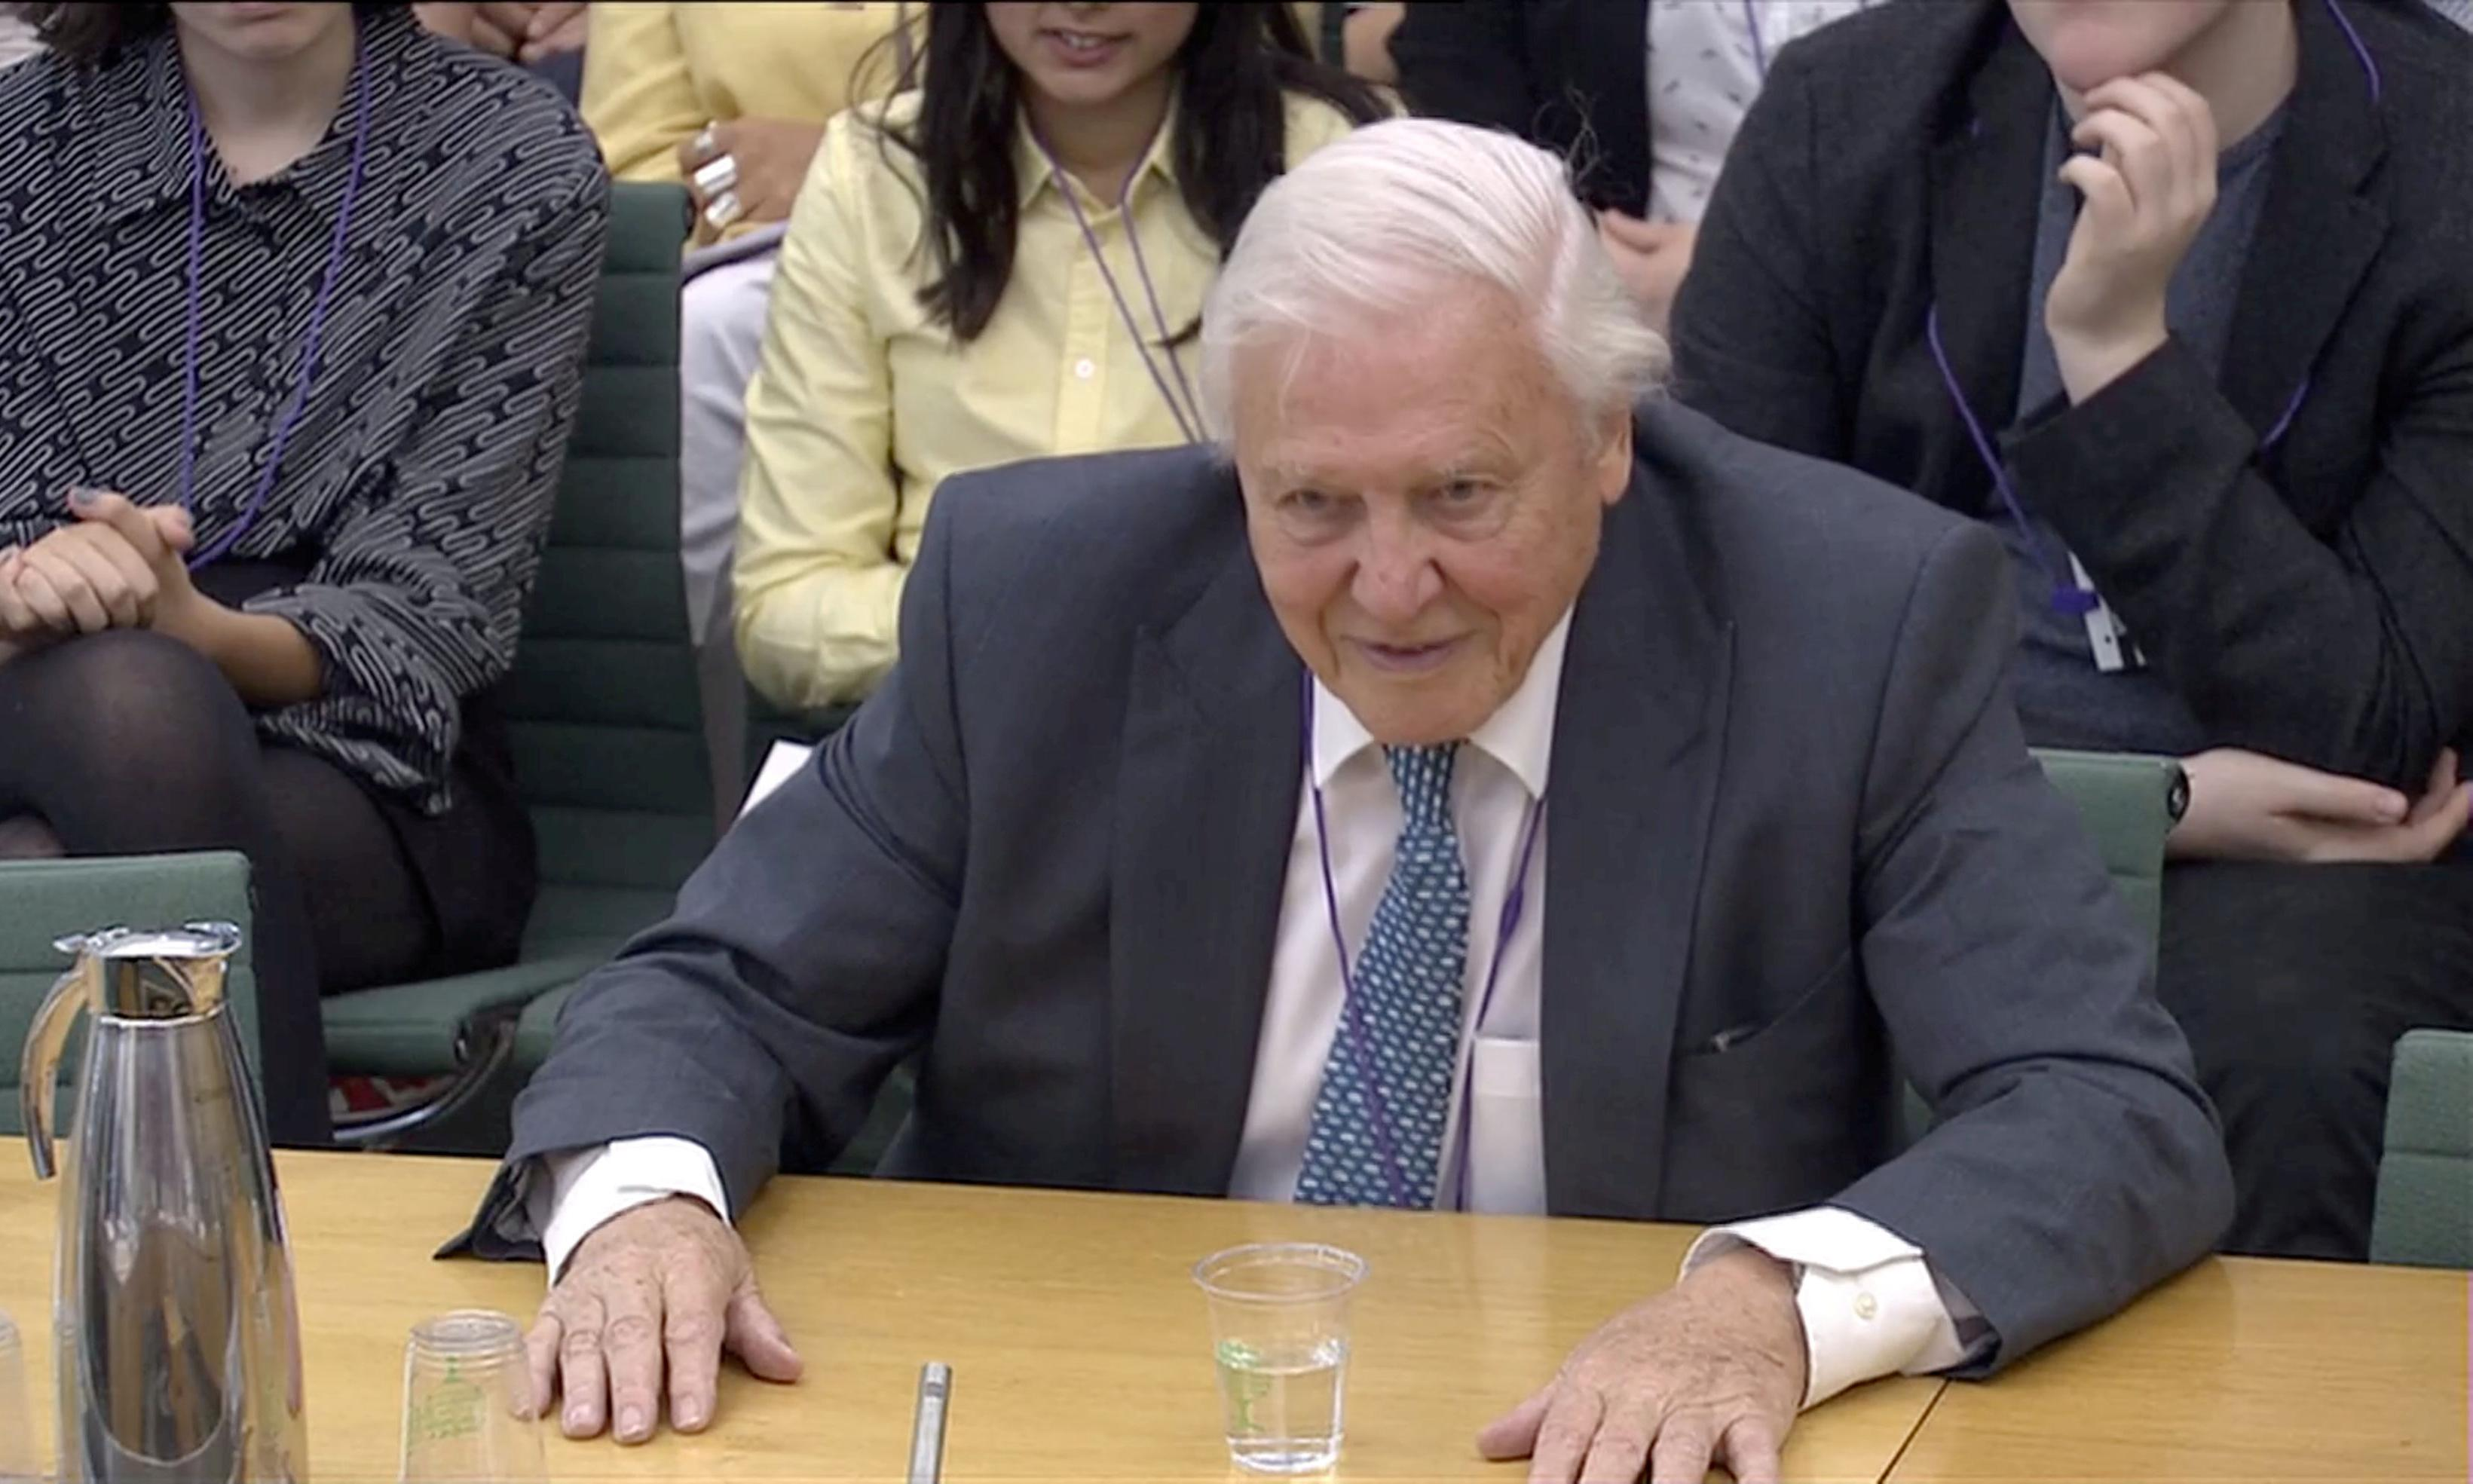 David Attenborough: polluting planet may become as reviled as slavery